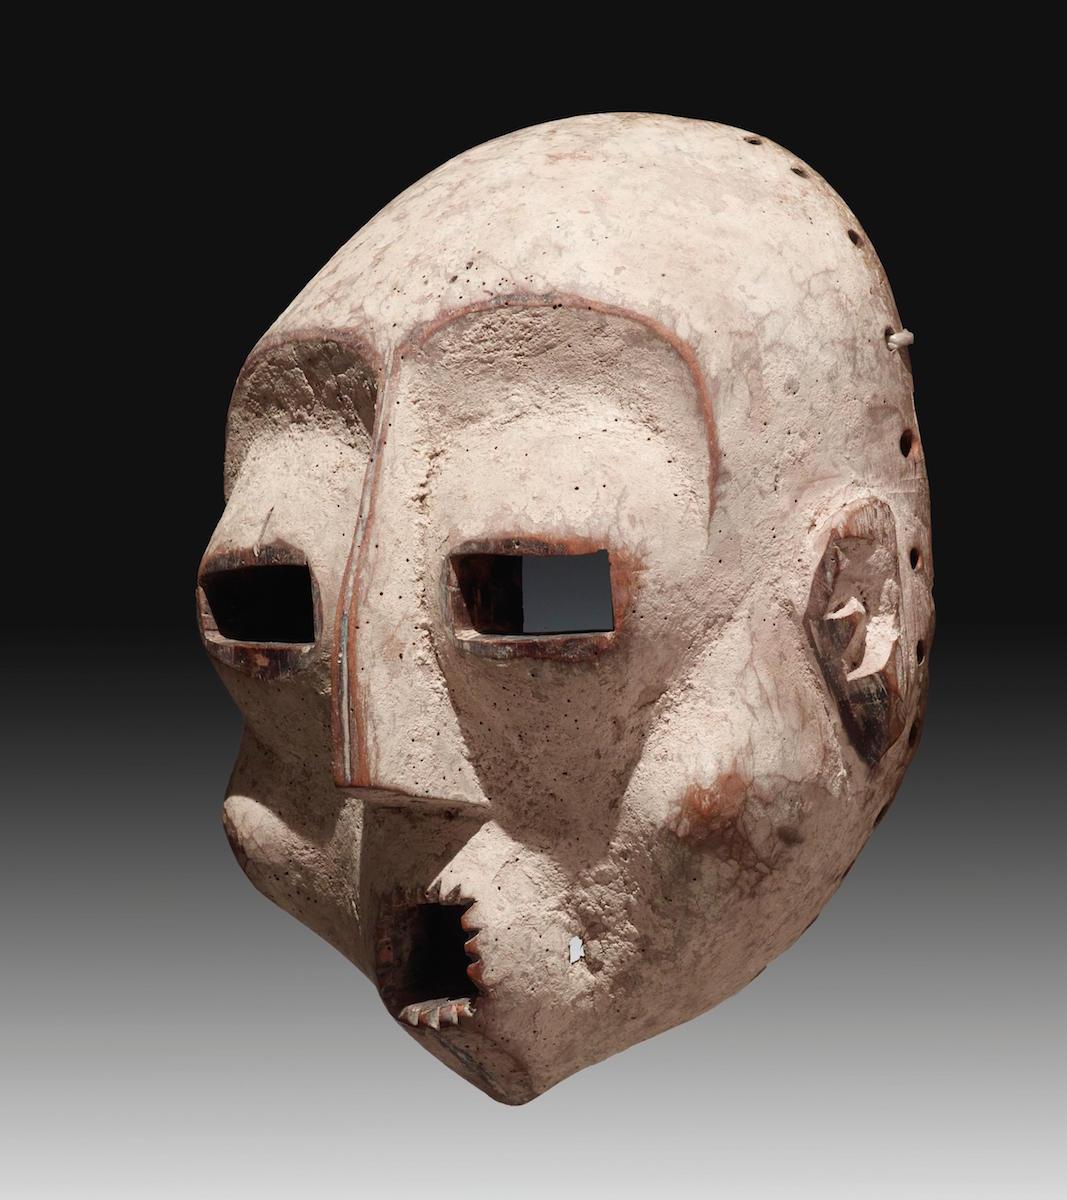 "Lega ""Idimu"" Maske, Holz, DR Kongo, um 1900, 44 cm, Lot Nr. 46, Rufpreis 30 000 €, Foto: Dorotheum, Wien"